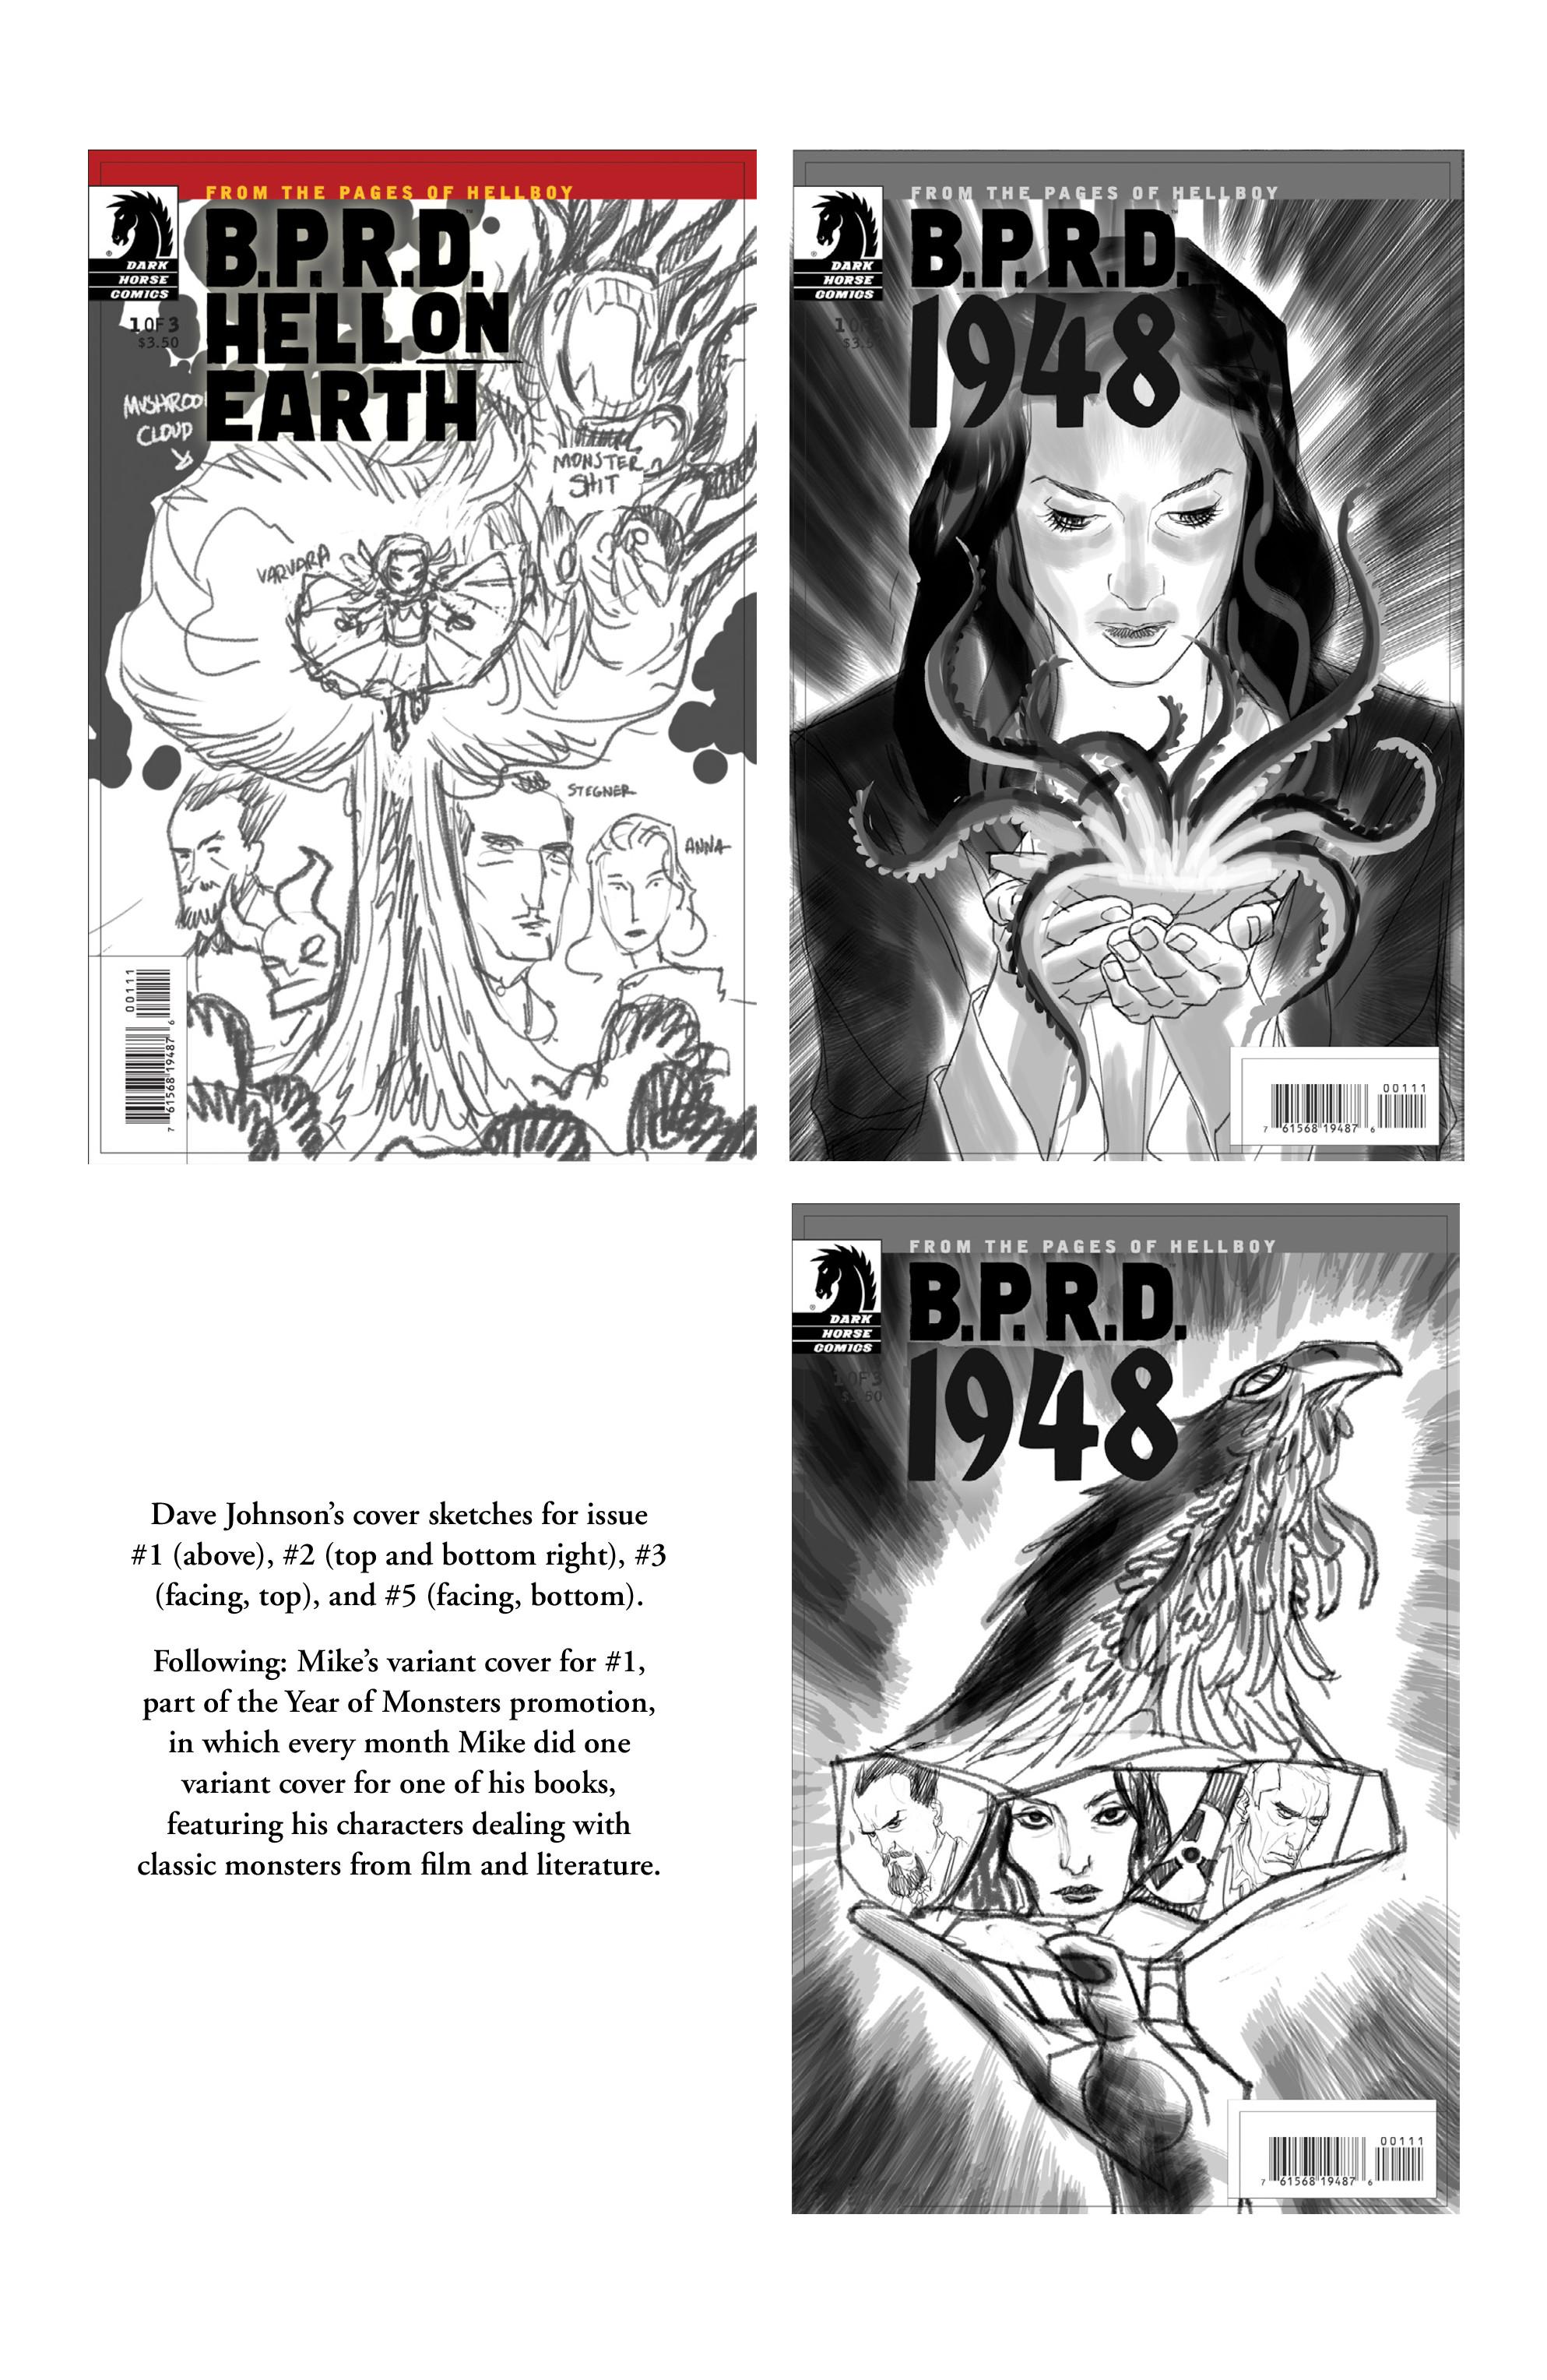 Read online B.P.R.D.: 1948 comic -  Issue # TPB - 140